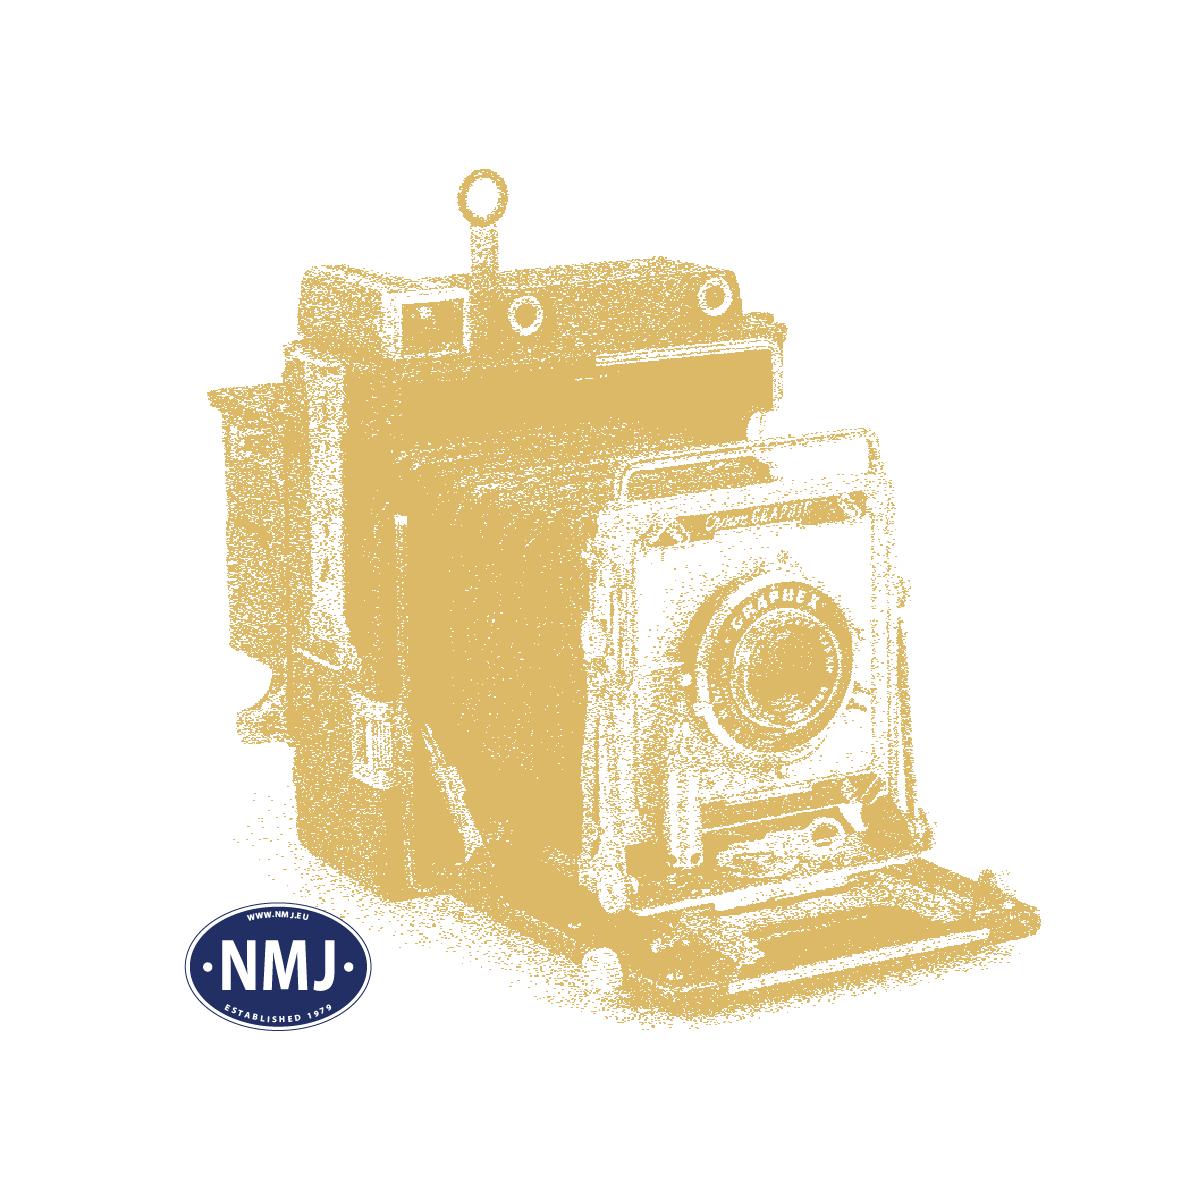 NMJT101.303 - NMJ Topline NSB WLABK 21079 Red/Black livery